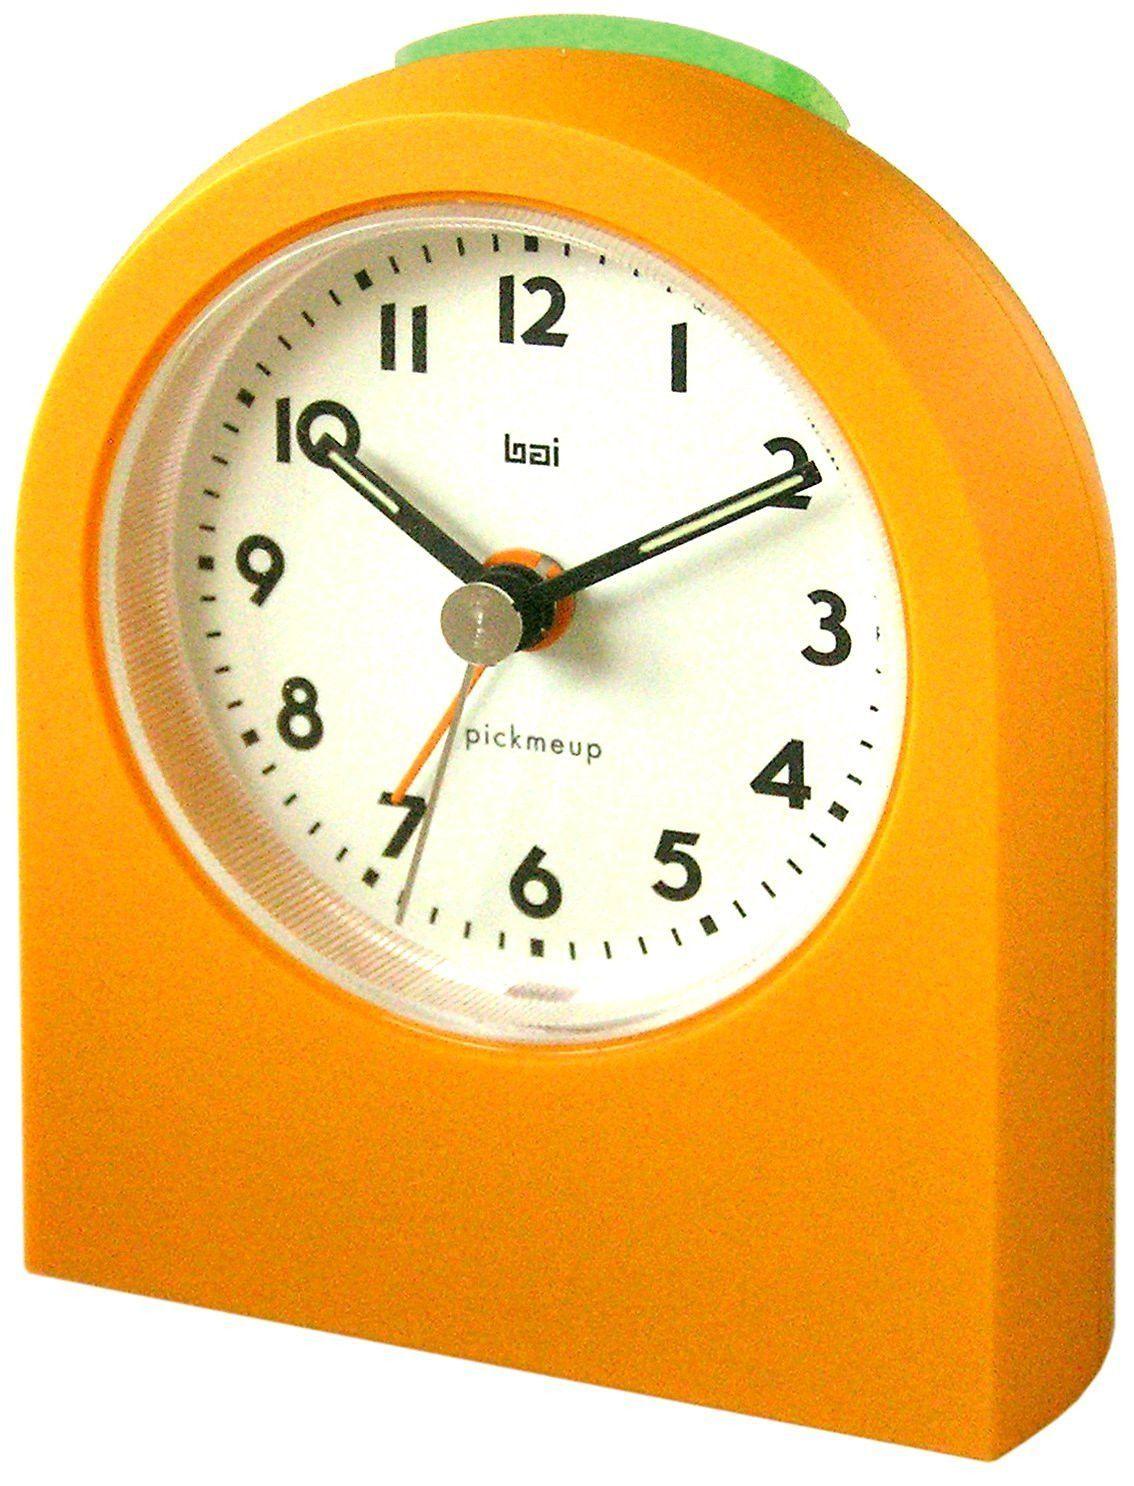 Pick-Me-Up clock - multiple colors